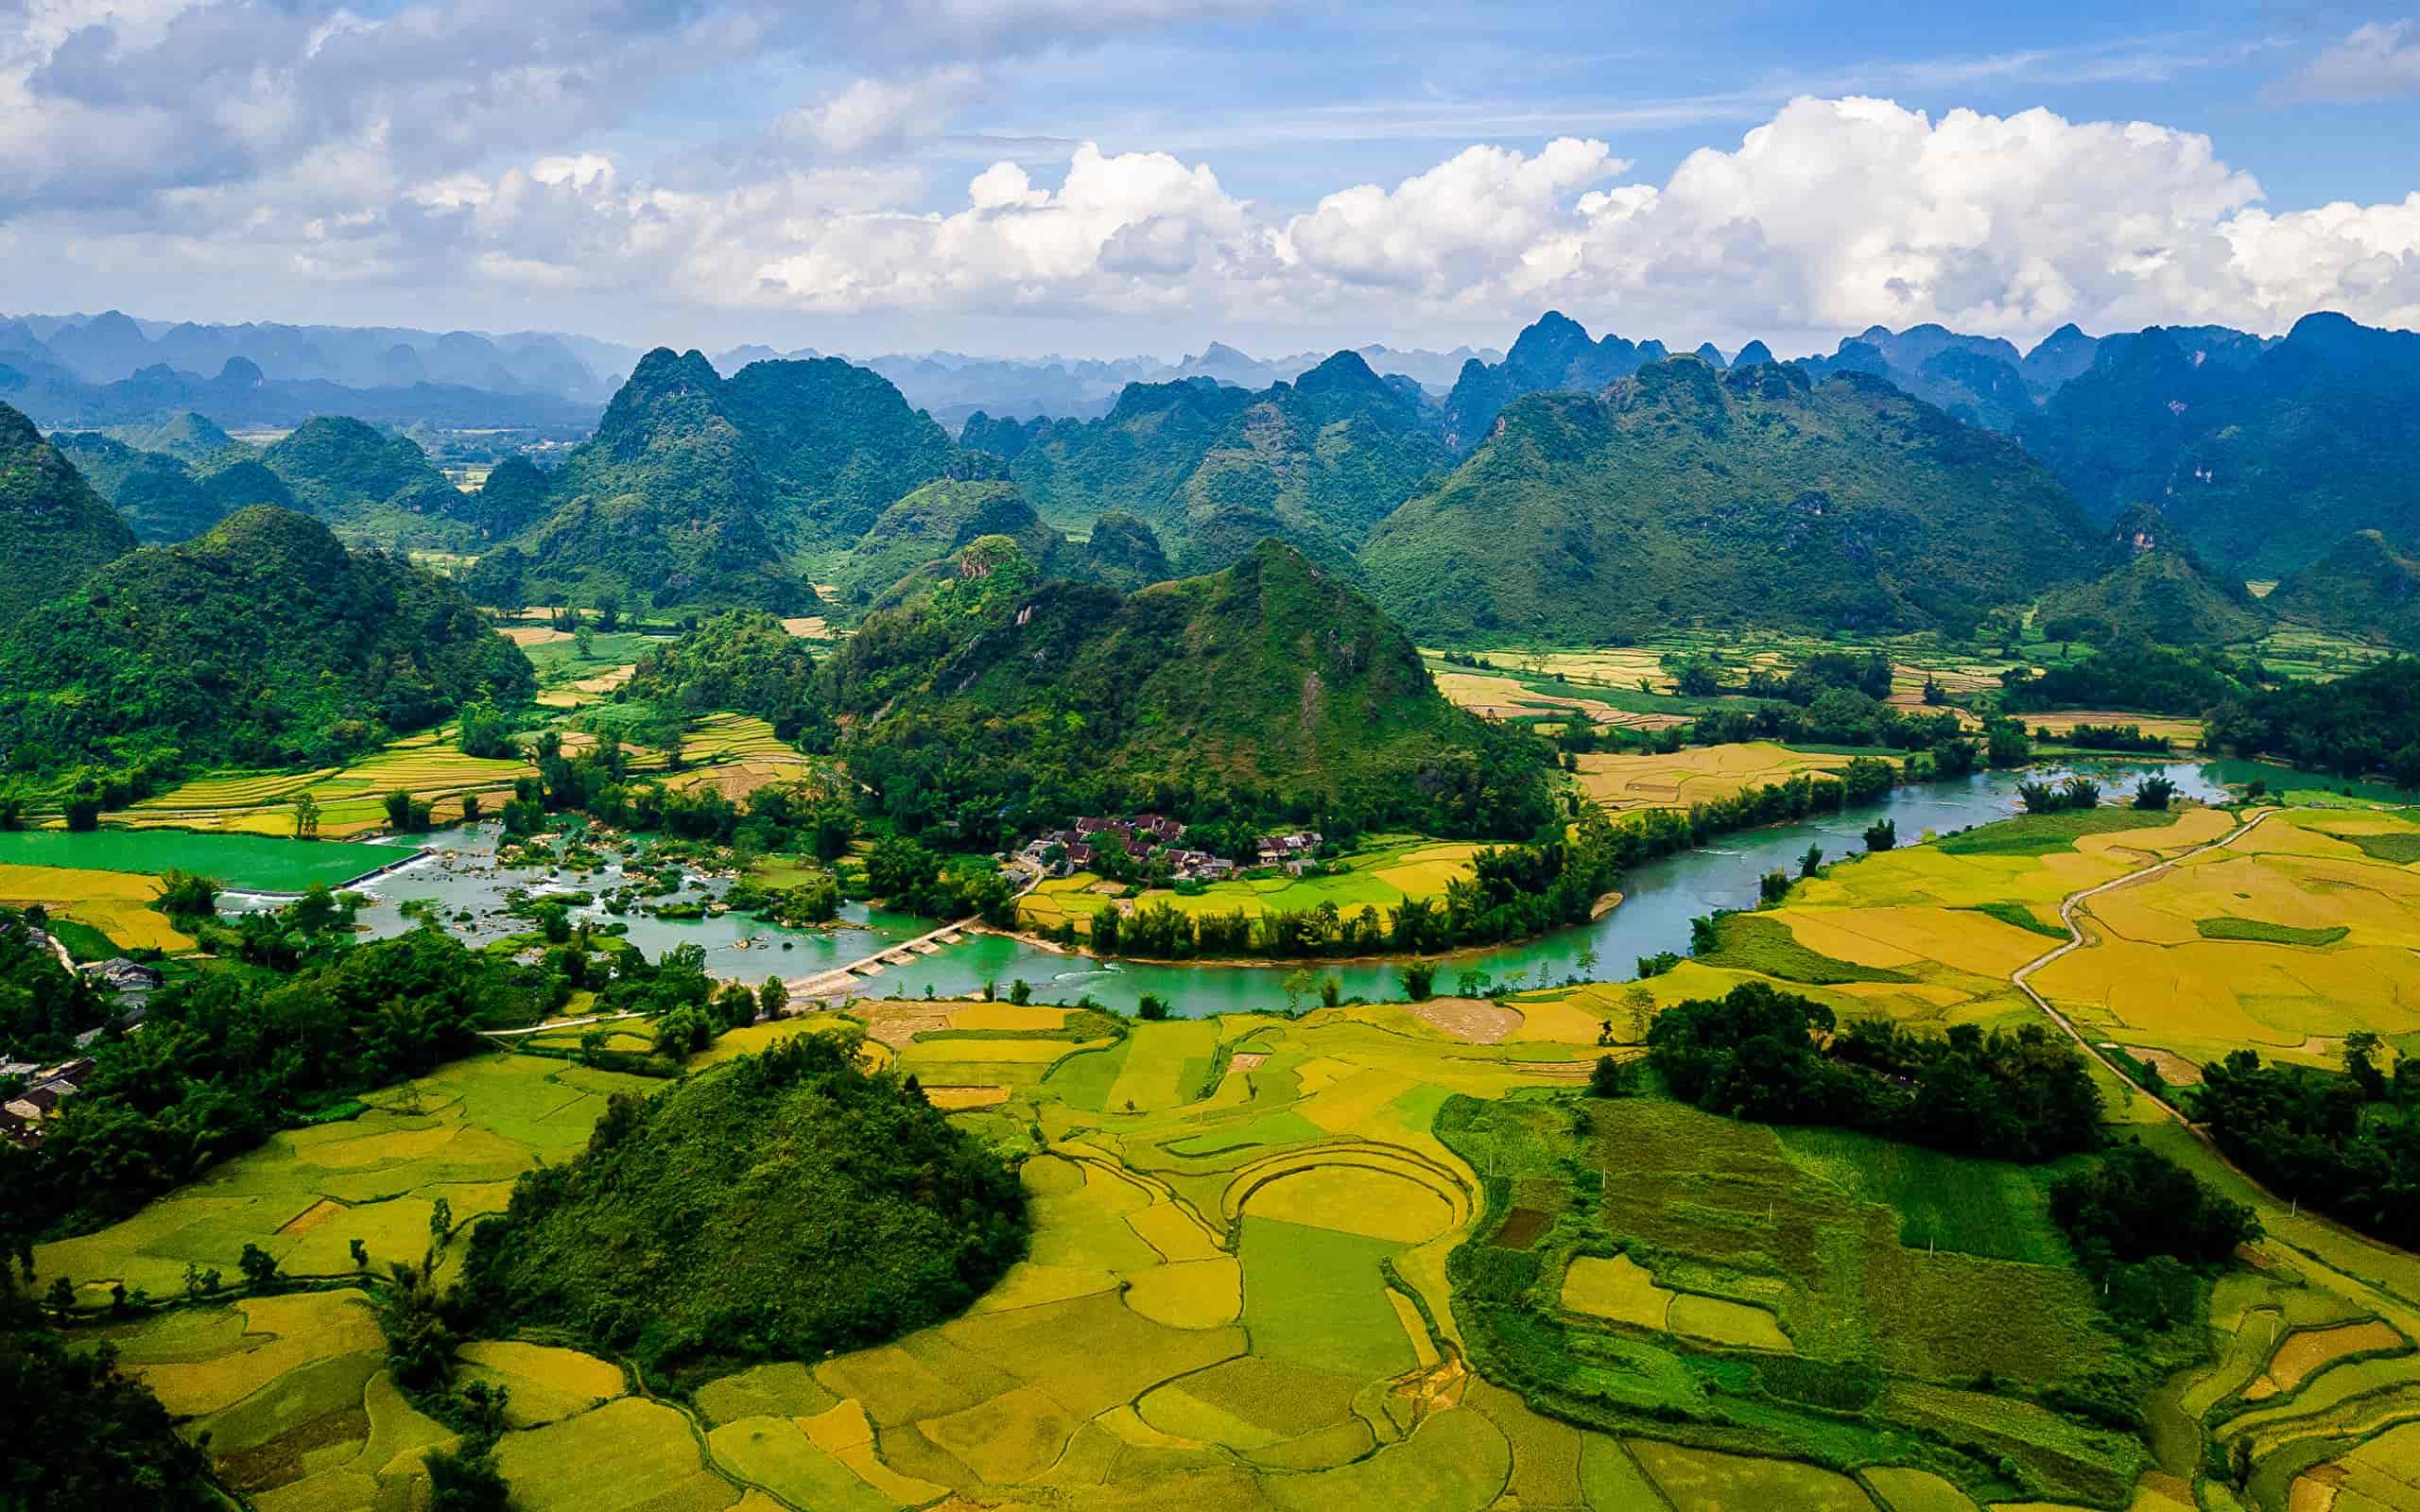 vietnam scenery